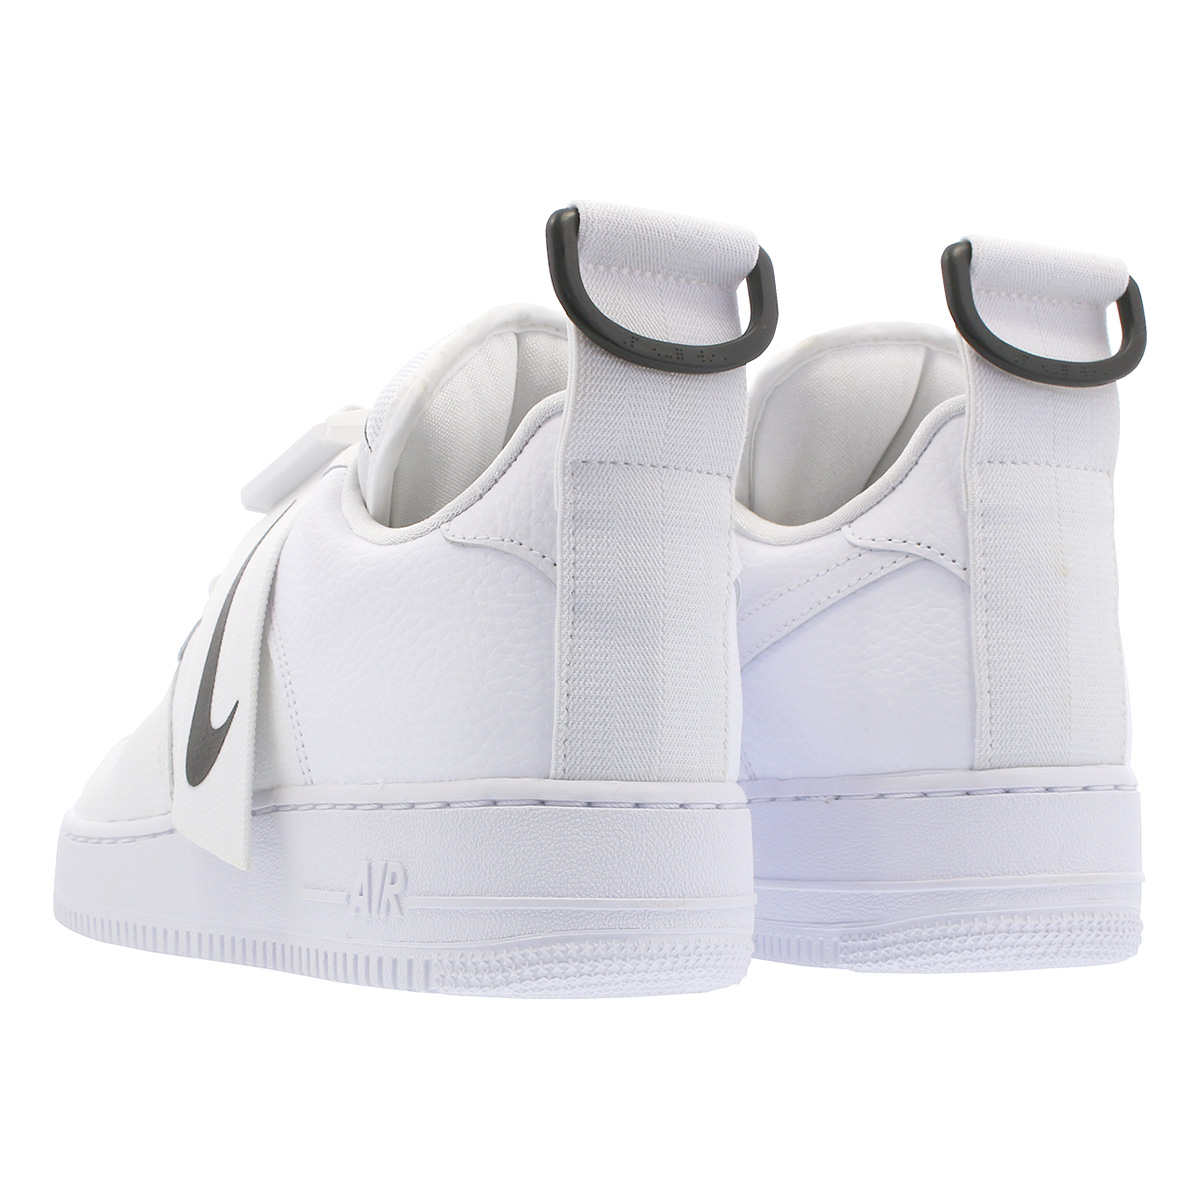 Nike Air Force 1 Utility White Black AO1531 101